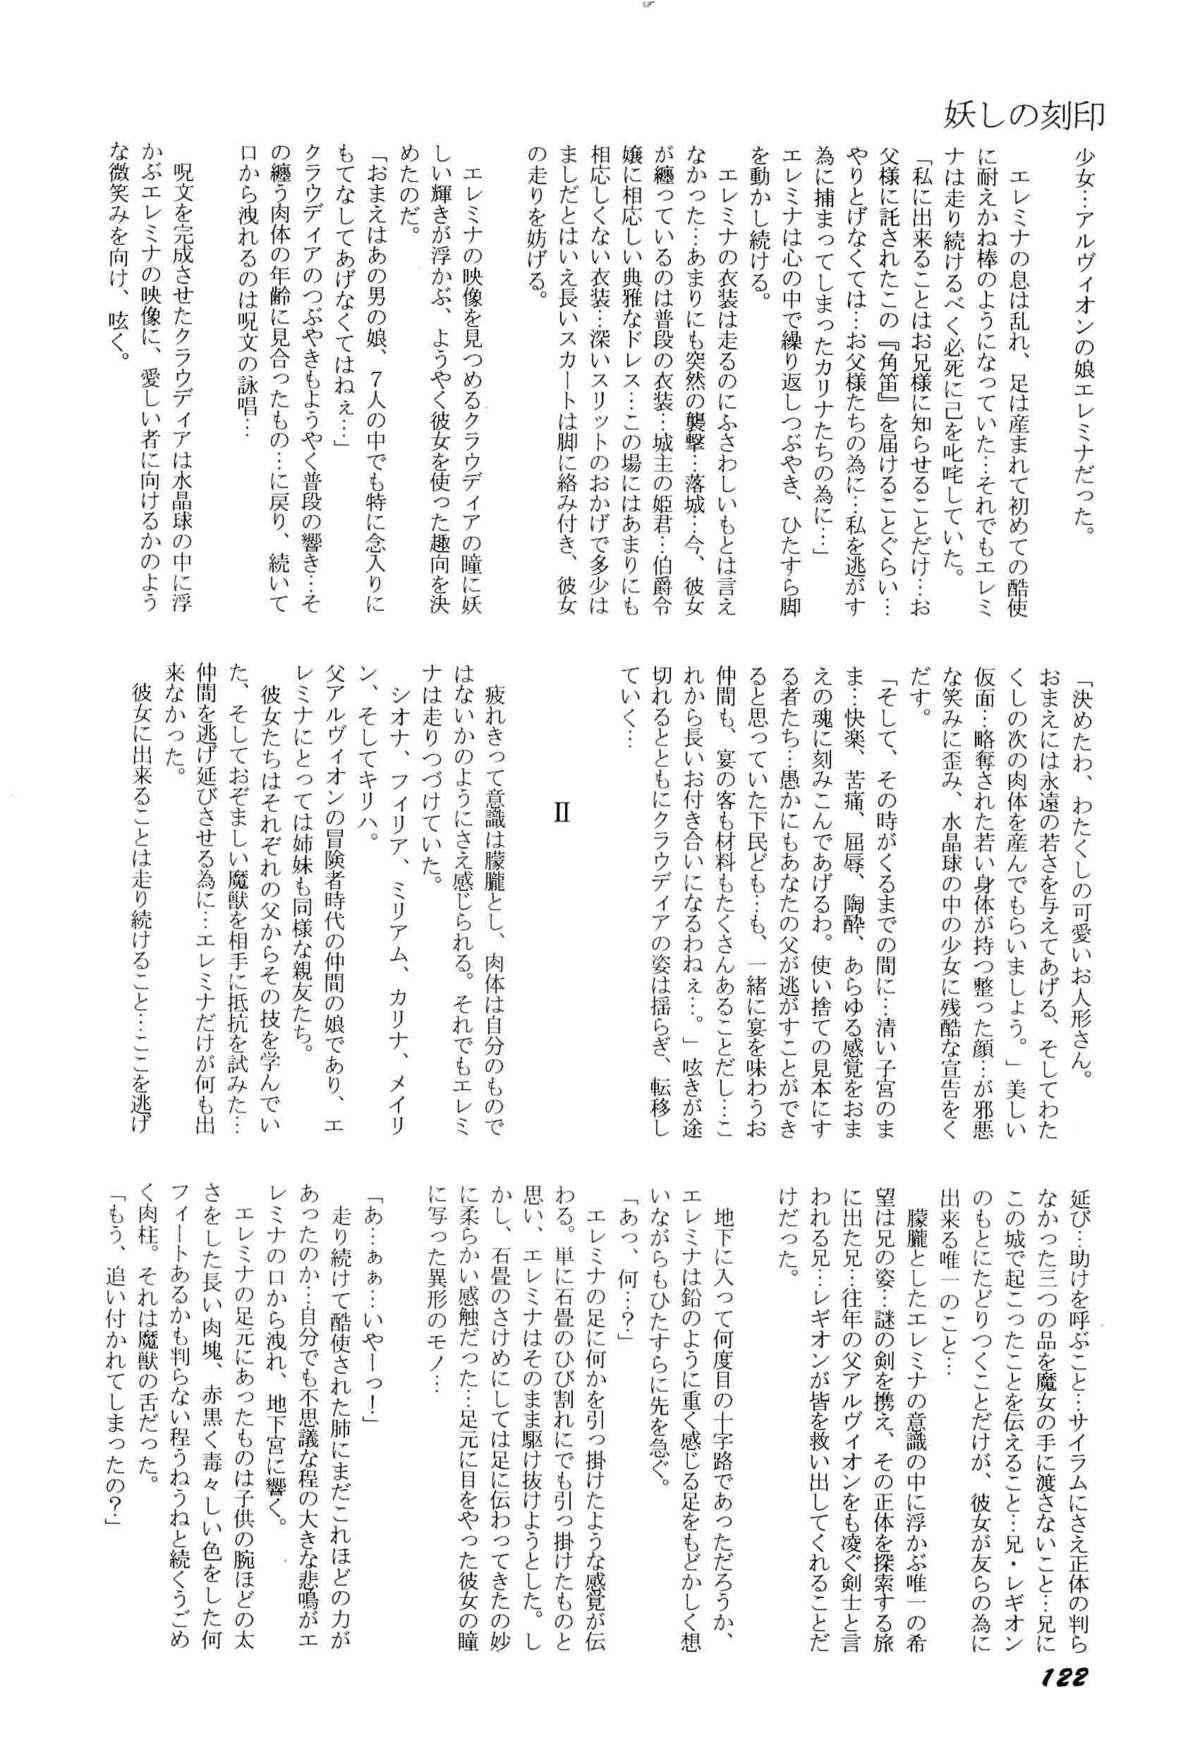 Bisyoujo Anthology '93 jyoukan 124